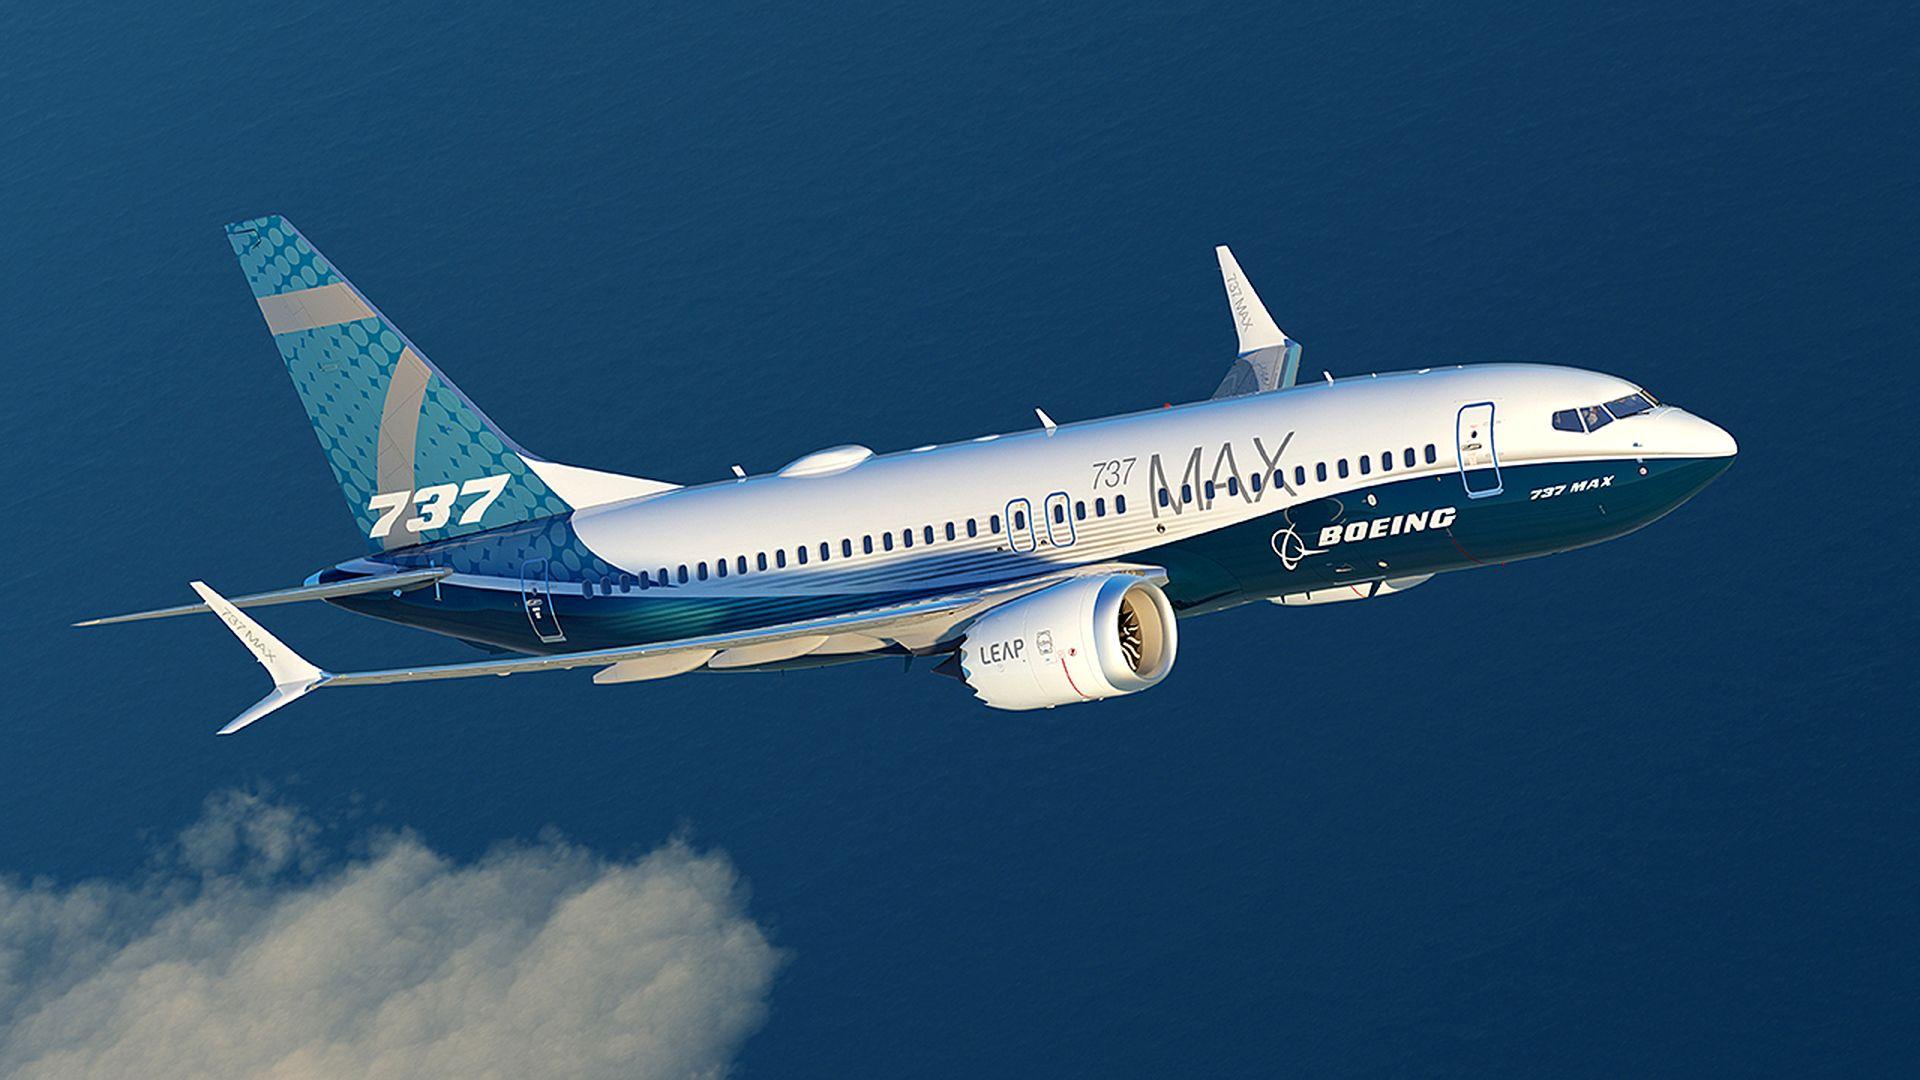 США сняли запрет на полеты самолетов Boeing 737 MAX